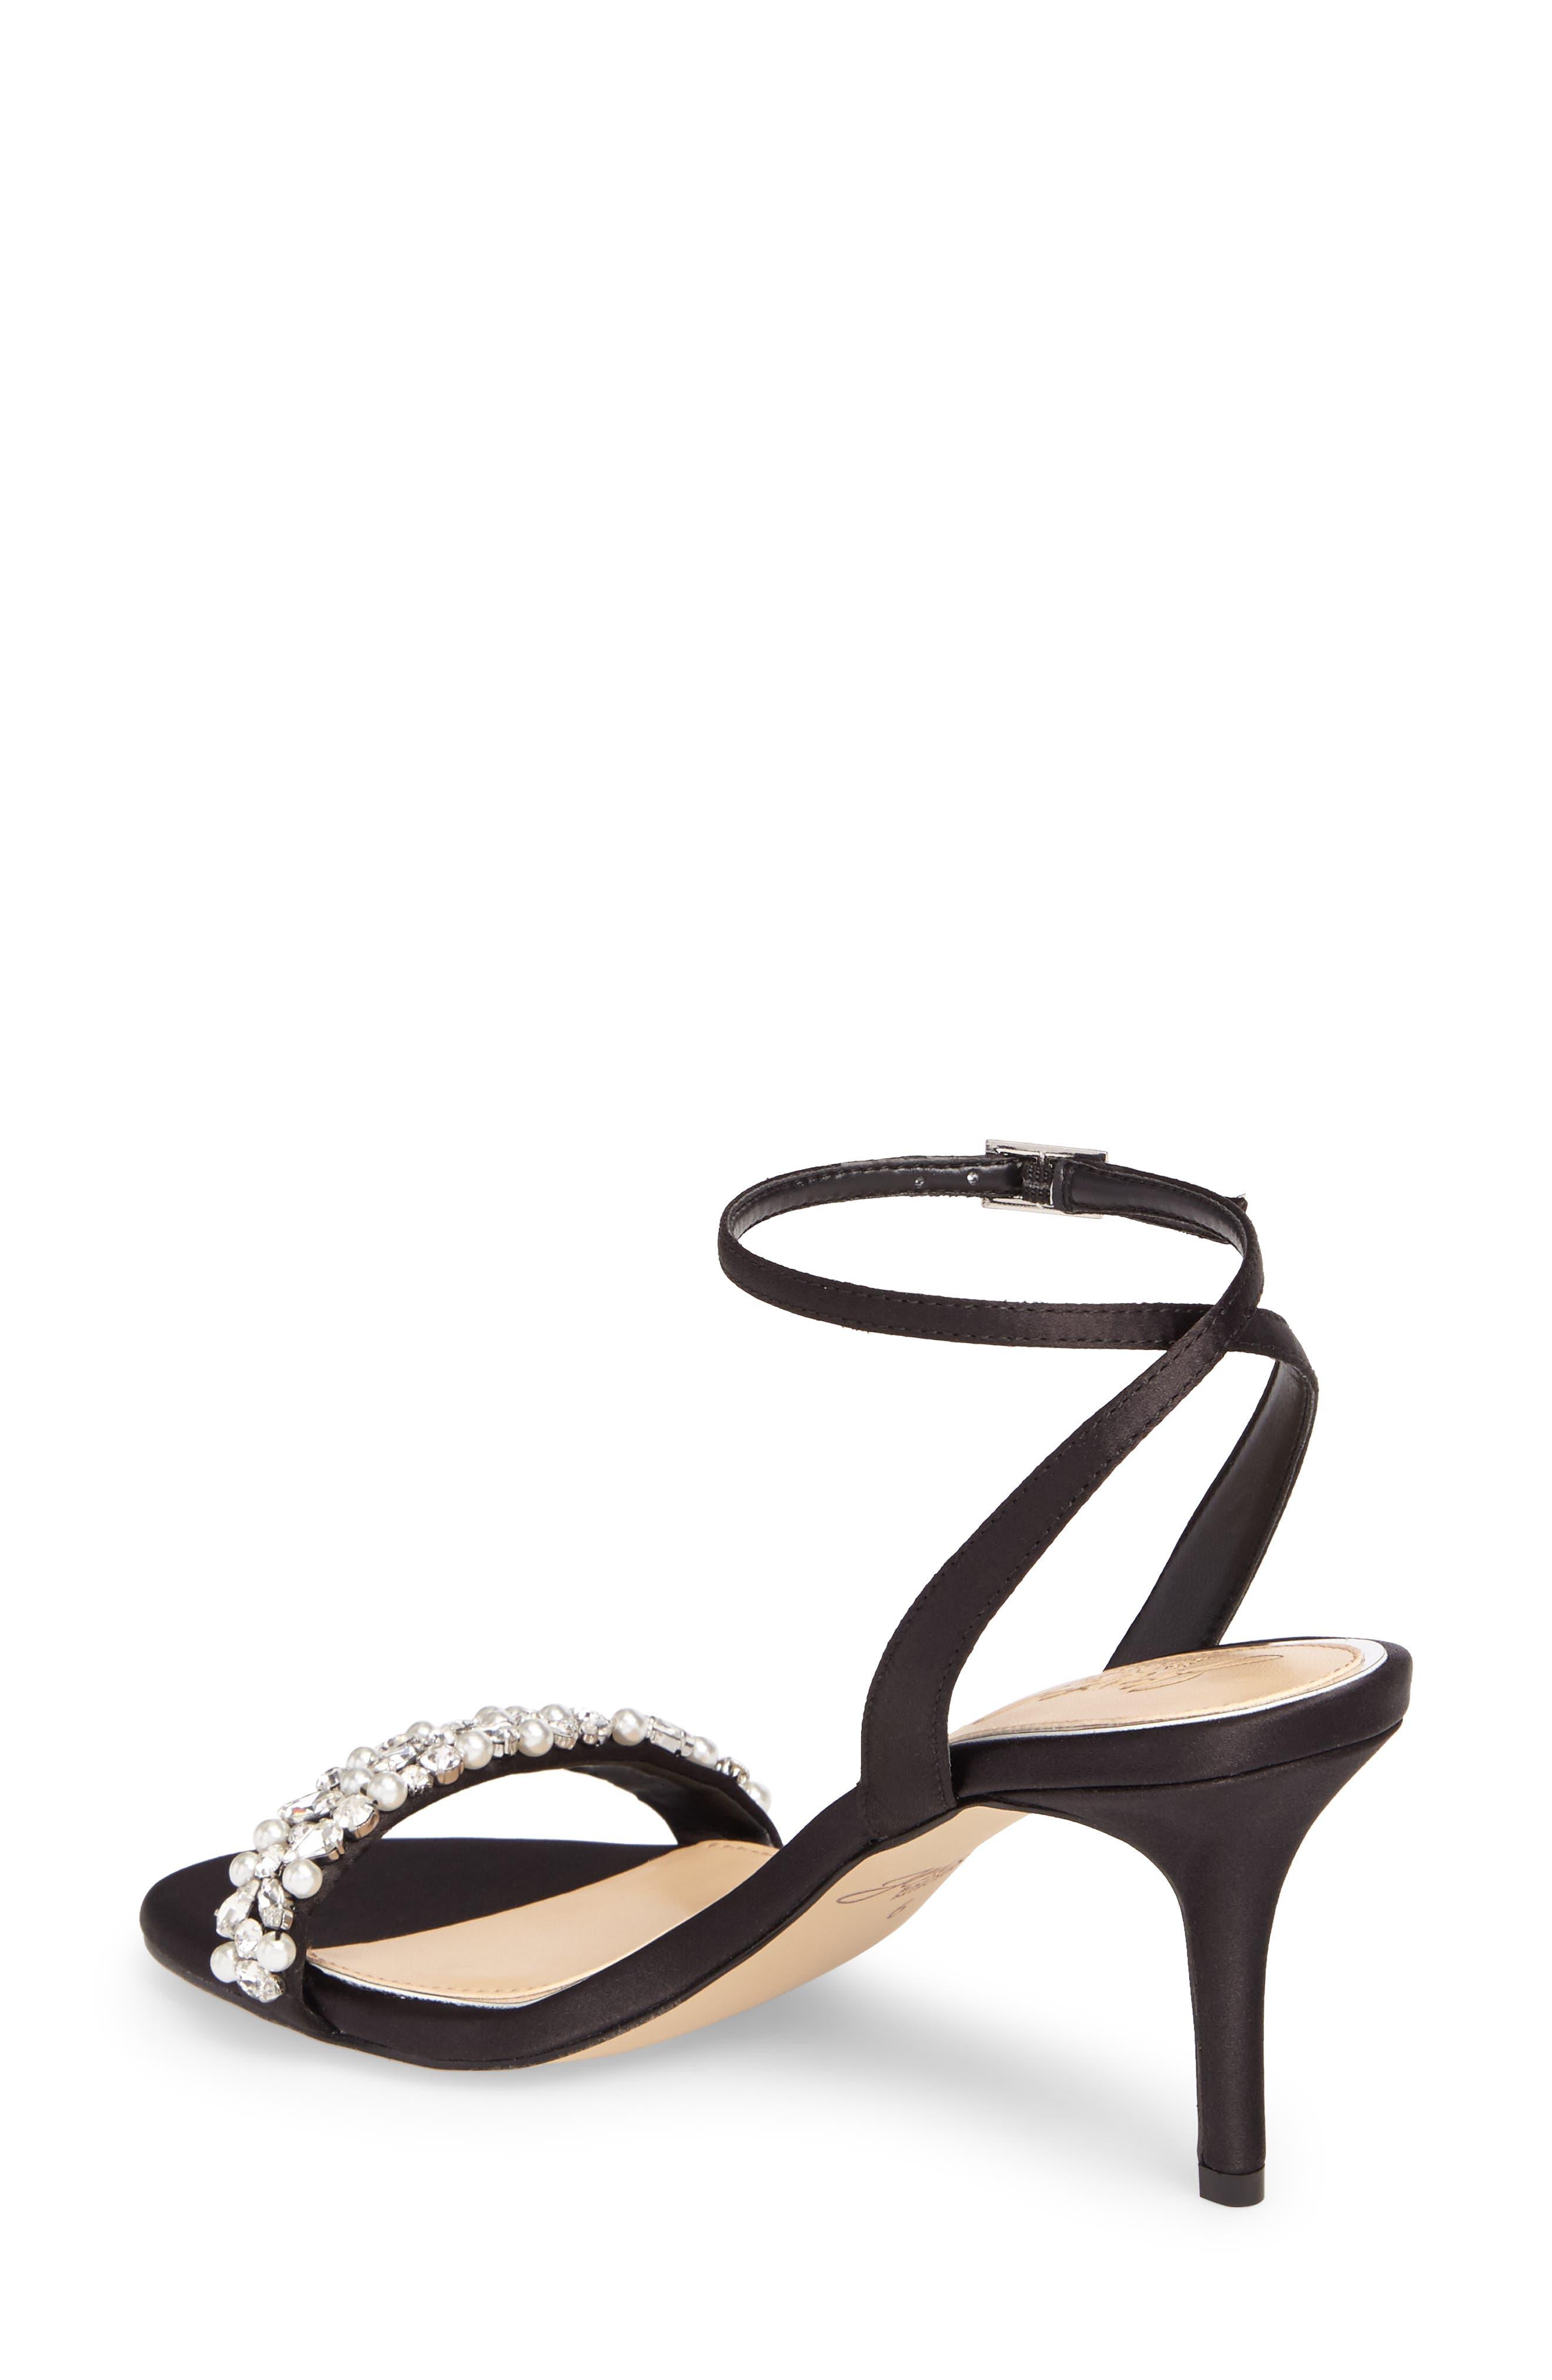 Jewel by Badgley Mischka Theodora Ankle Strap Sandal,                             Alternate thumbnail 2, color,                             Black Satin